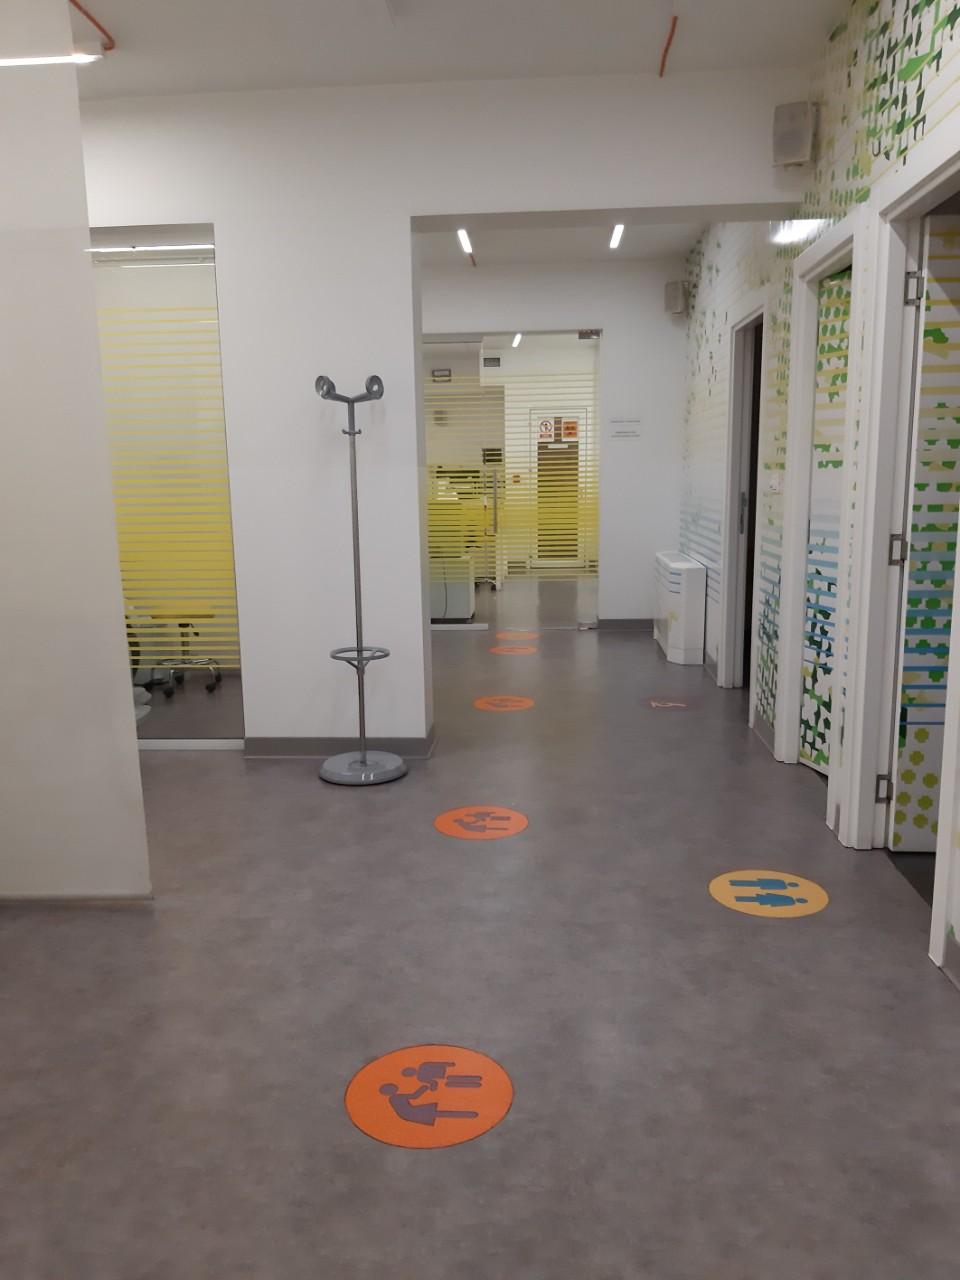 Beo-lab laboratorija Resavska 60, Beograd, Savski Venac 22